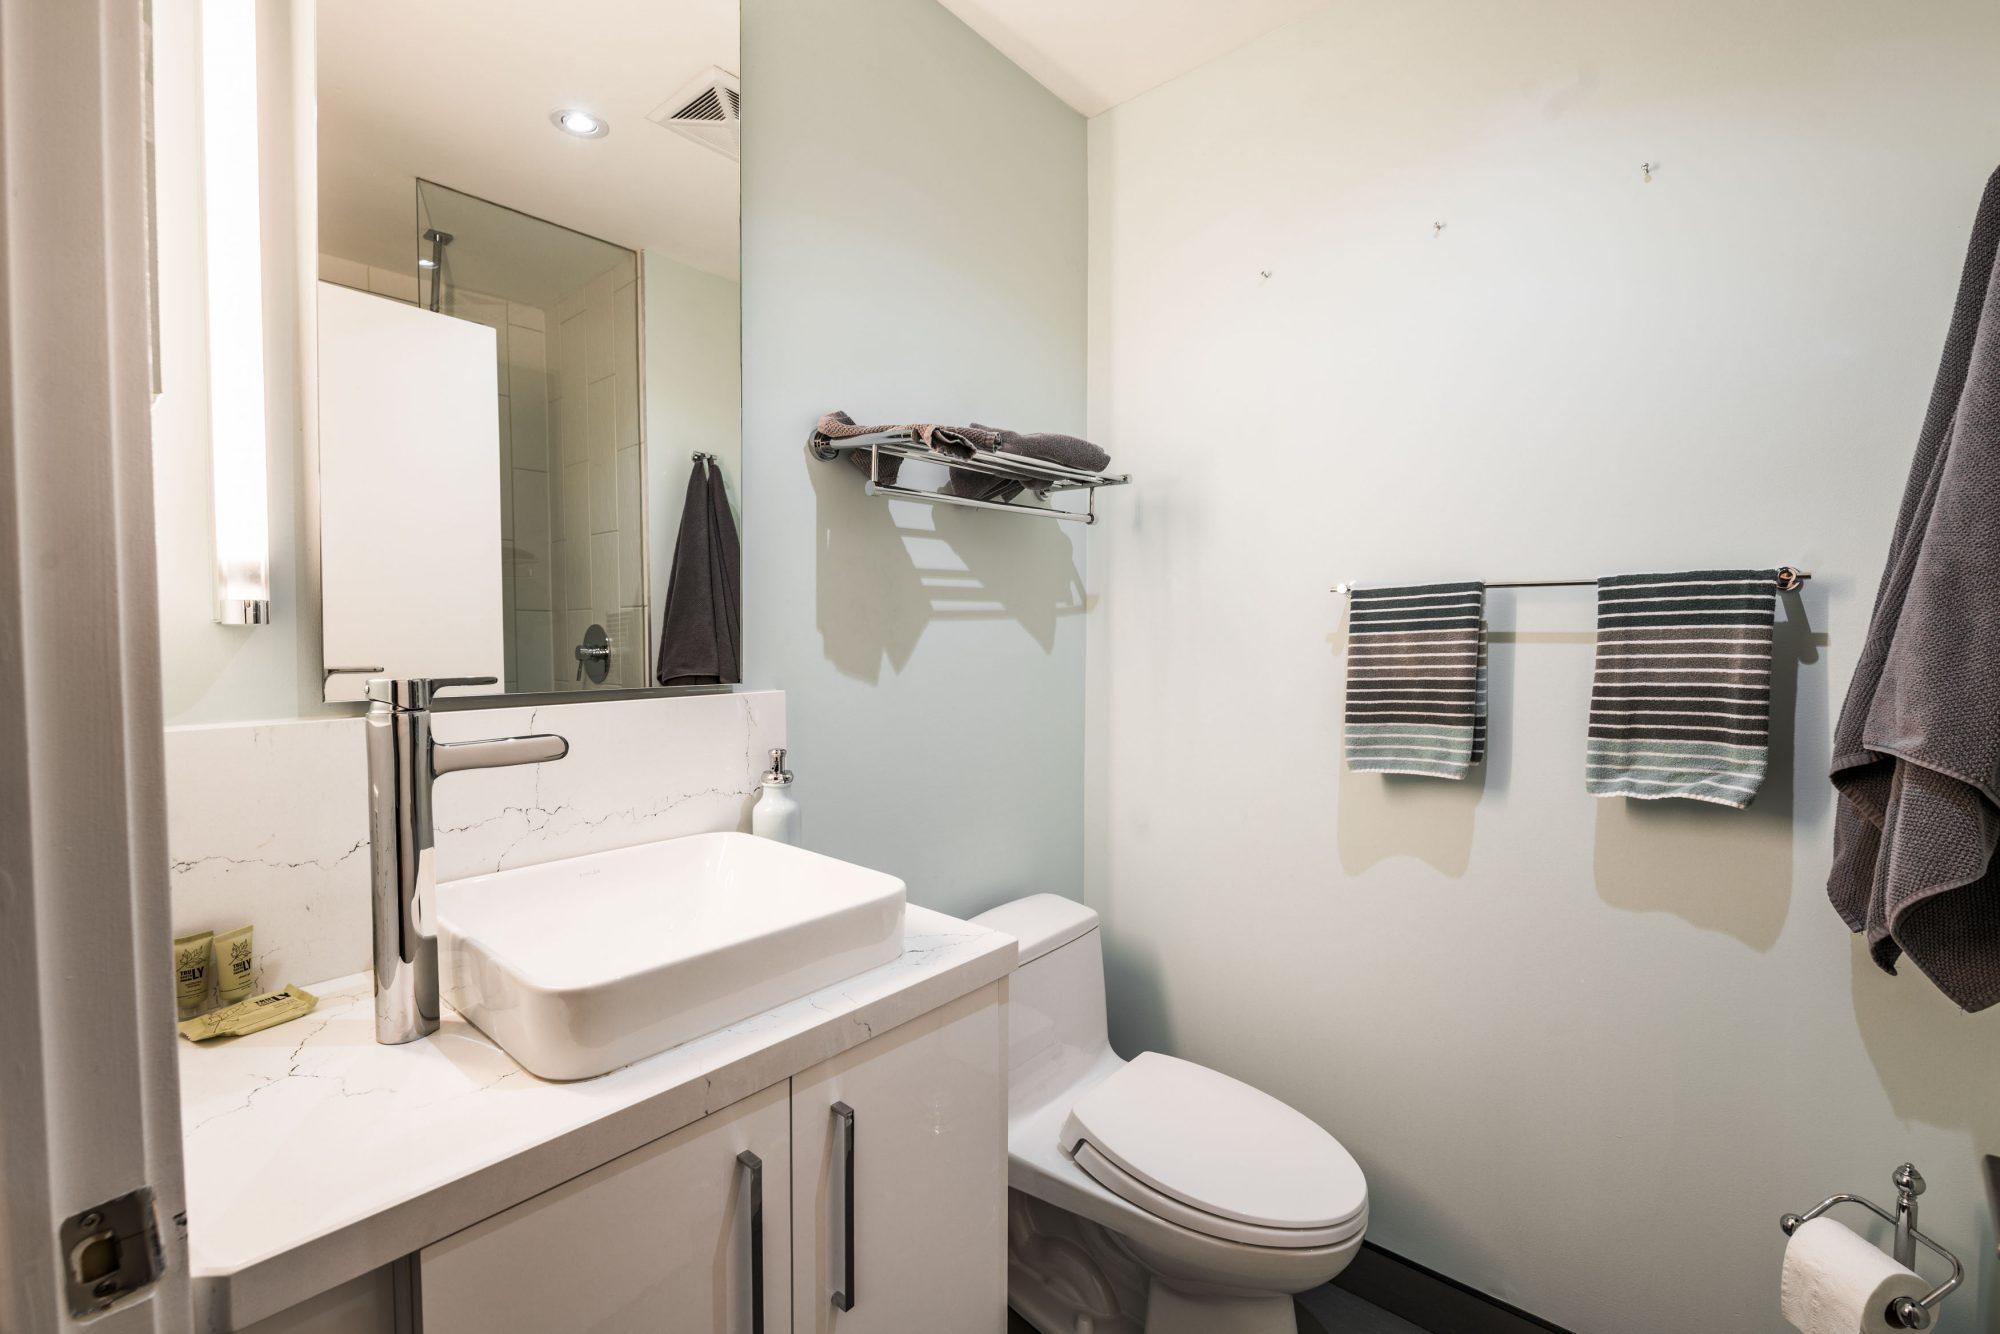 toronto-apartment-for-rent-25-oxley-street-7